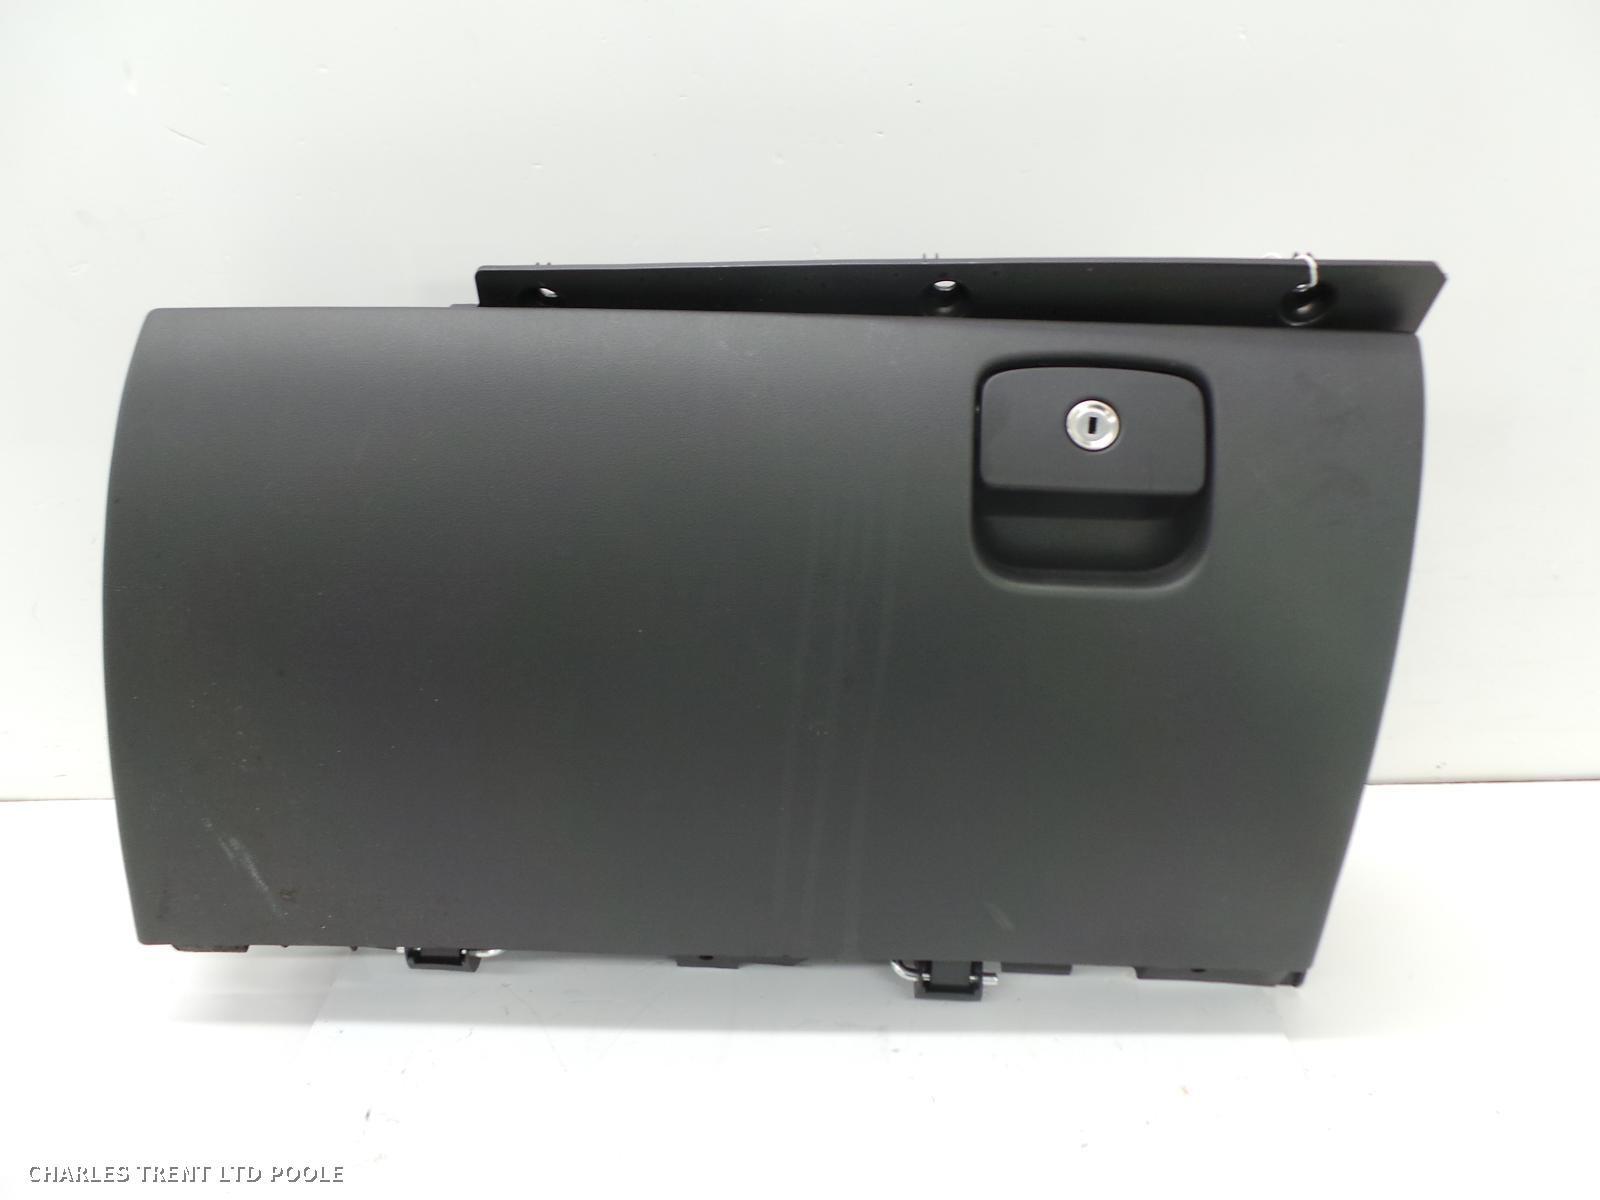 2016 - JAGUAR - XE - GLOVE BOX